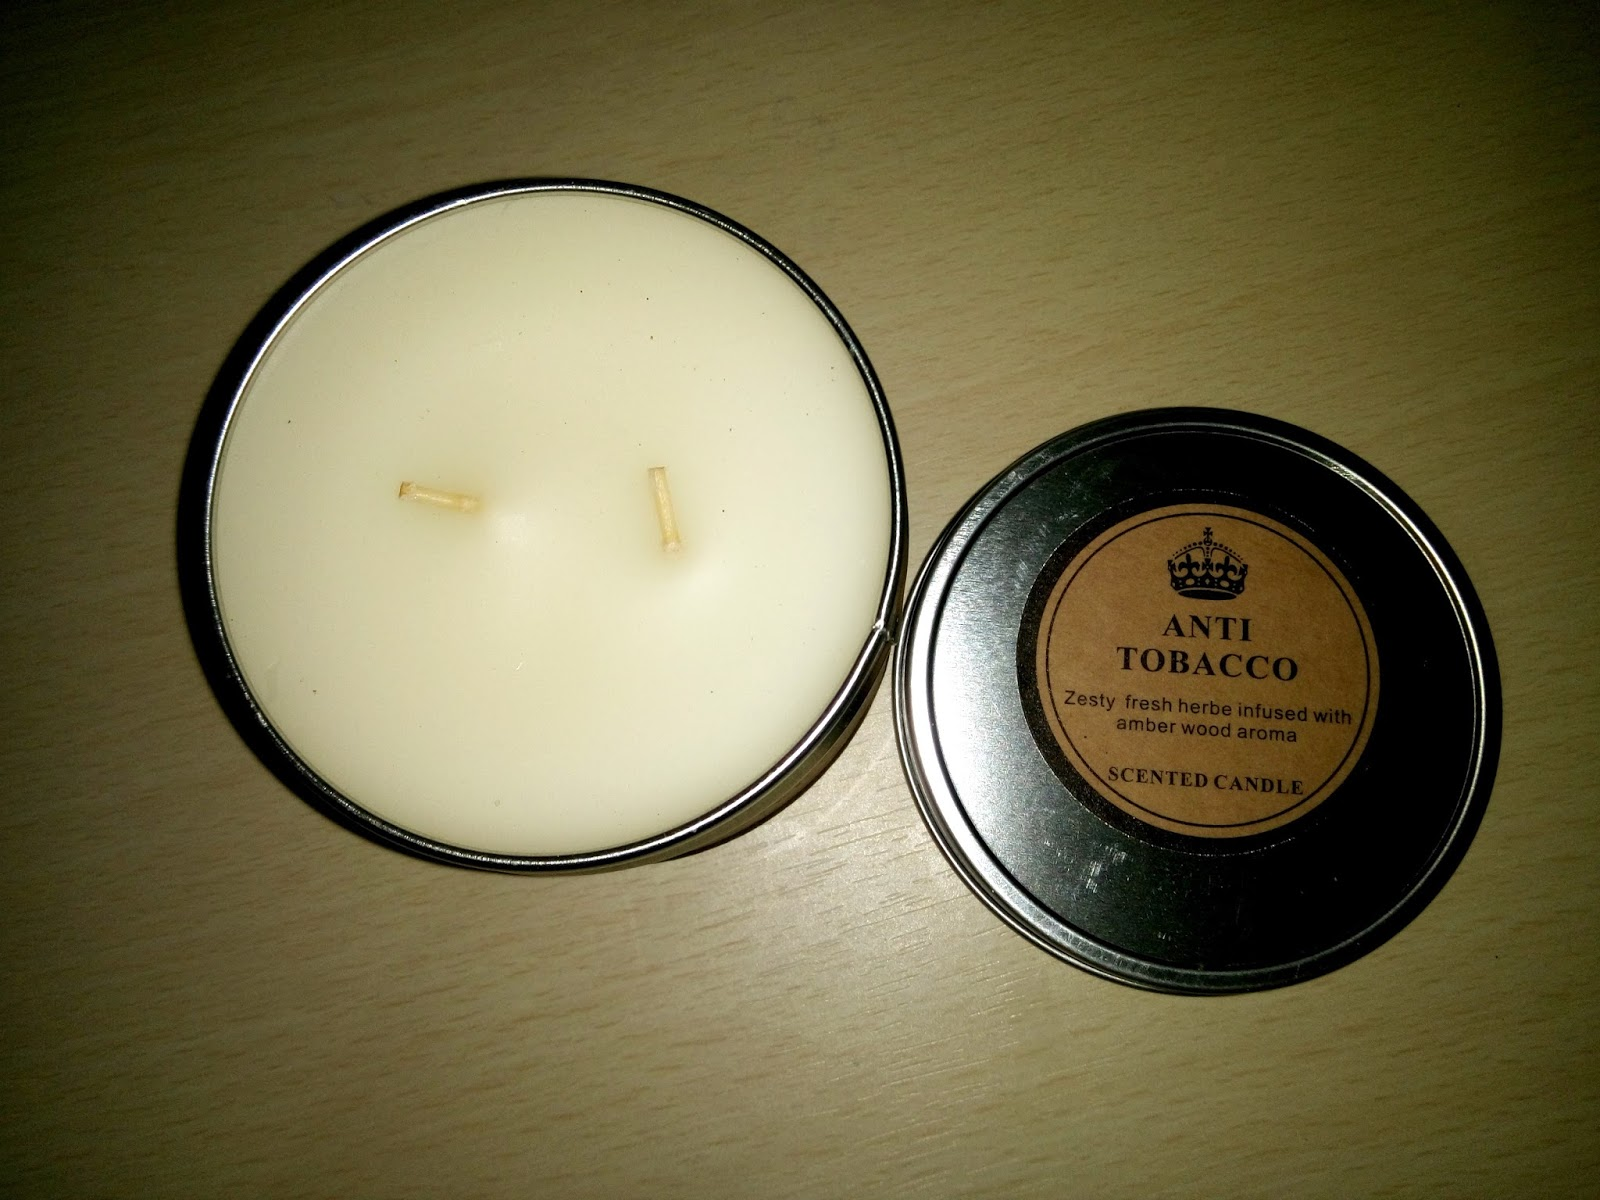 71e1d9b96d9 Και φυσικά, επίσκεψη στα Jumbo χωρίς να αγοράσω κάποιο κερί δεν γίνεται!!!  Αυτή τη φορά επέλεξα ενα ειδικό για να εξαφανίζει και να ελαχιστοποιεί τη  μυρωδιά ...